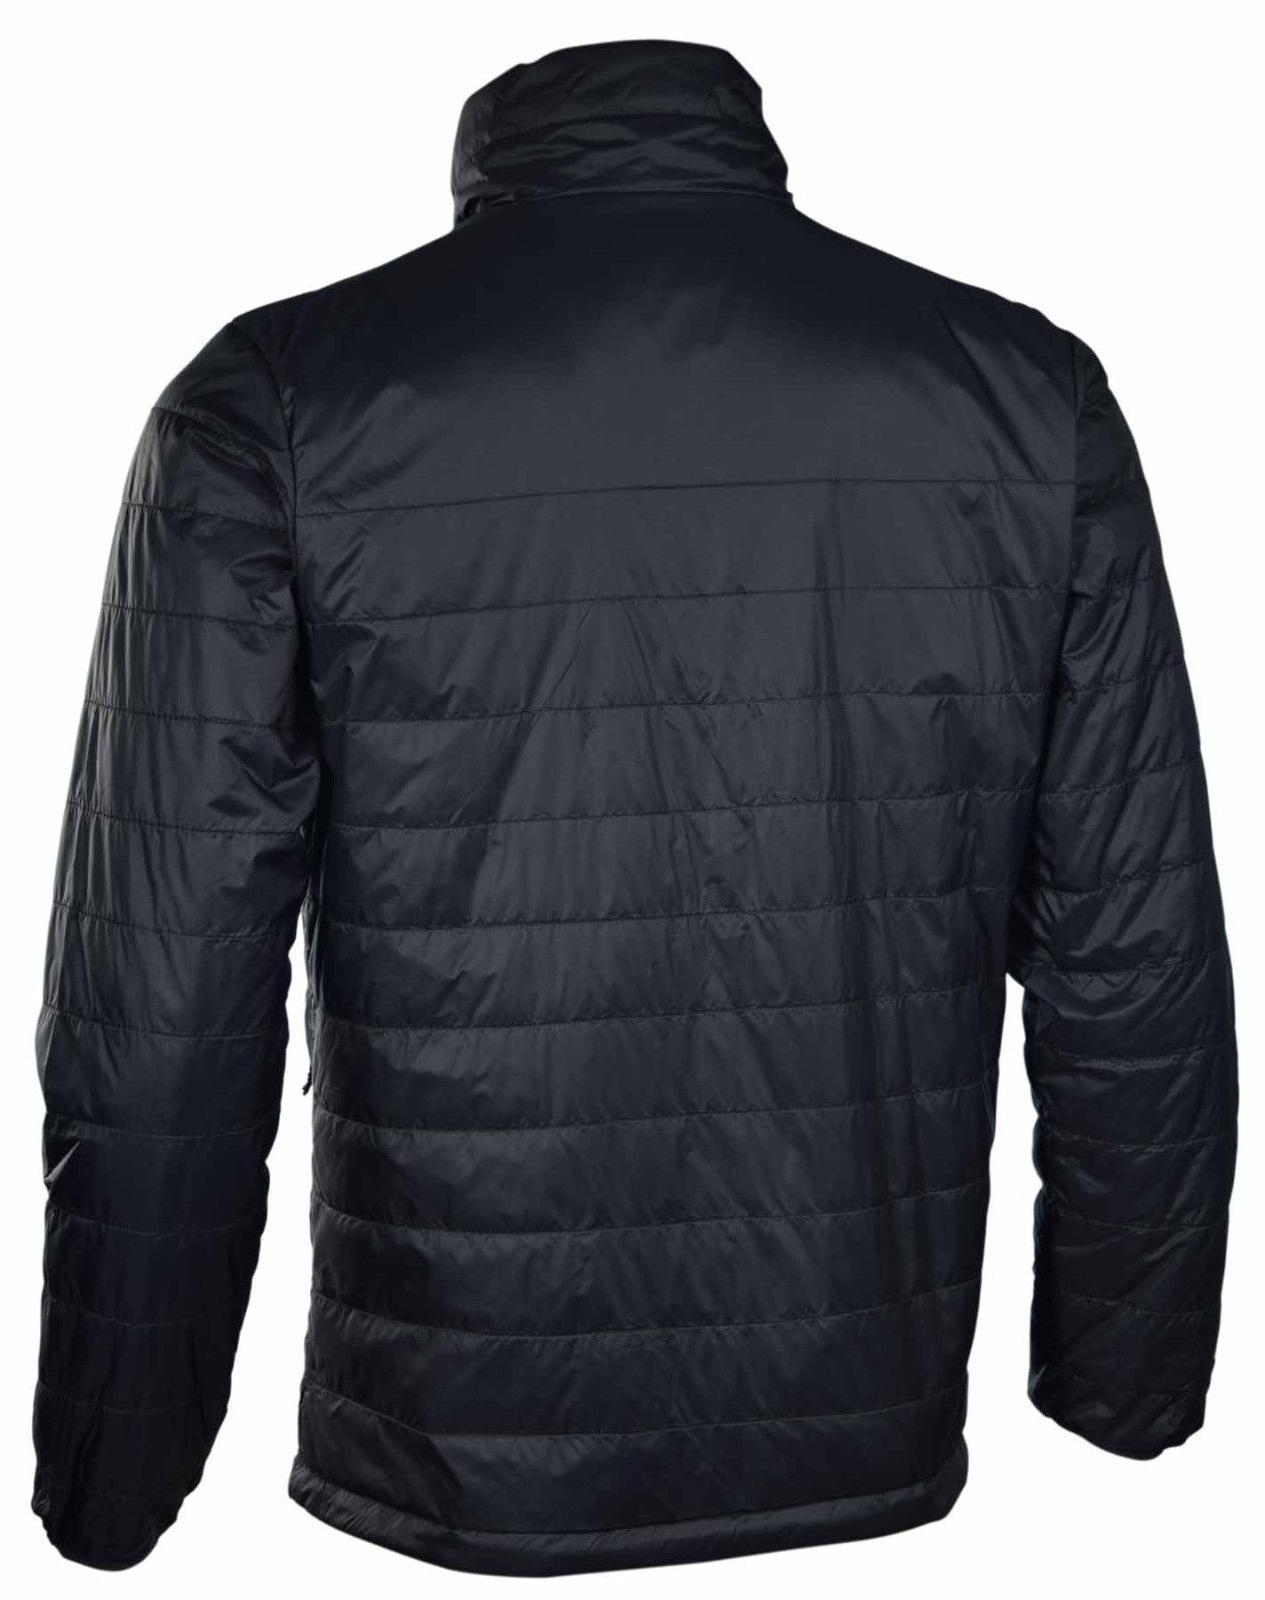 New Butte Omni-Heat Winter Jacket Coat